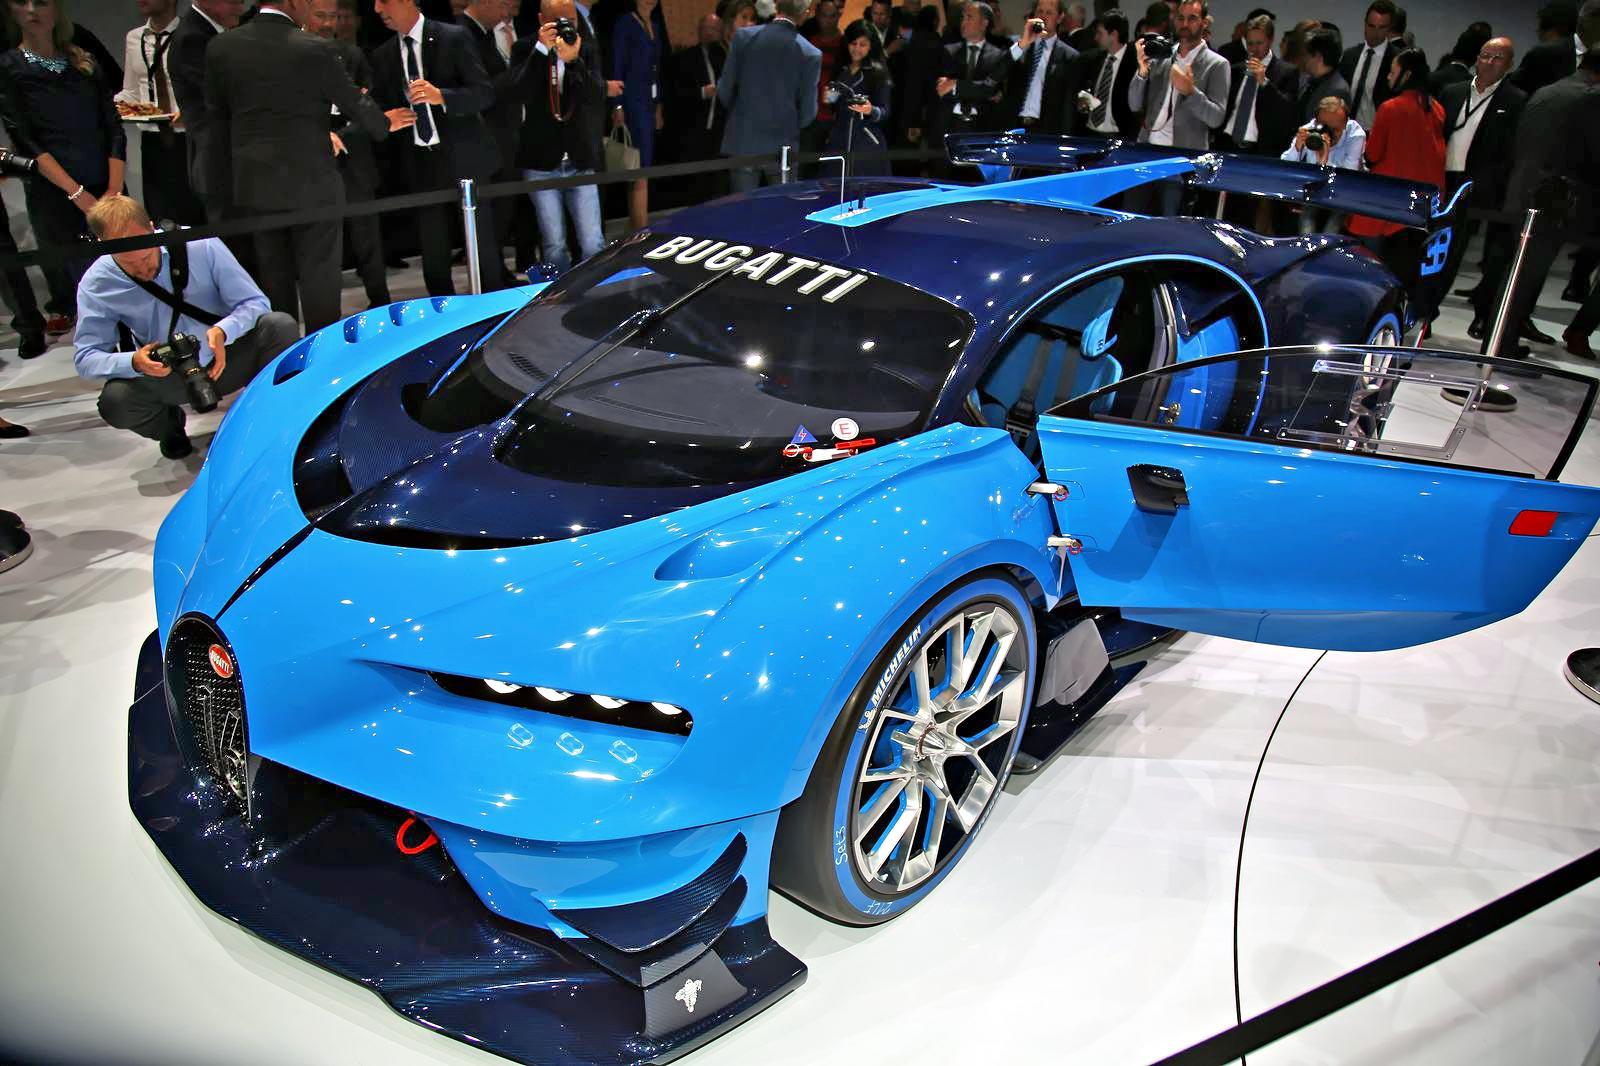 Bugatti представила гиперкар из компьютерной игры - журнал За рулем